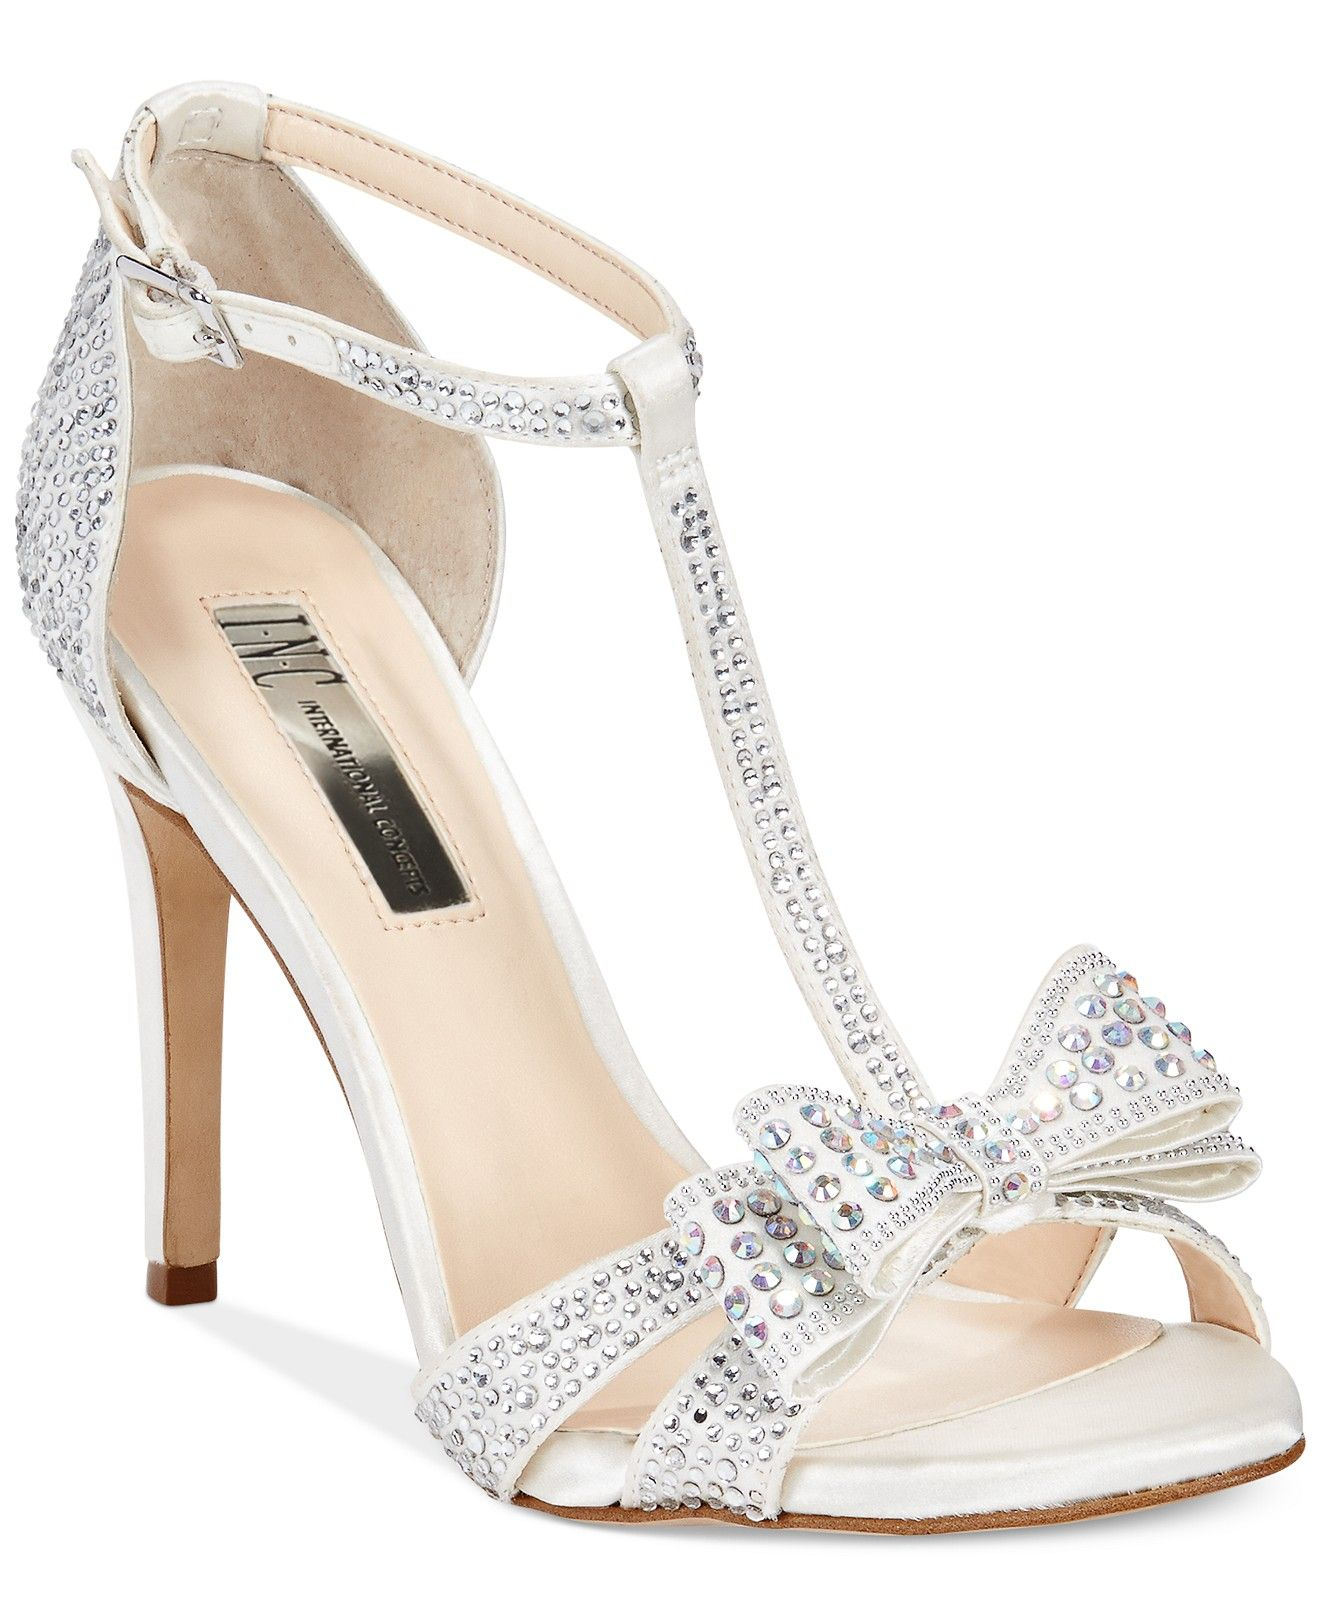 INC International Concepts Women's Reesie2 High Heel Evening Sandals -  Evening & Bridal - Shoes - - INC International Concepts Women's Reesie2 High Heel Evening